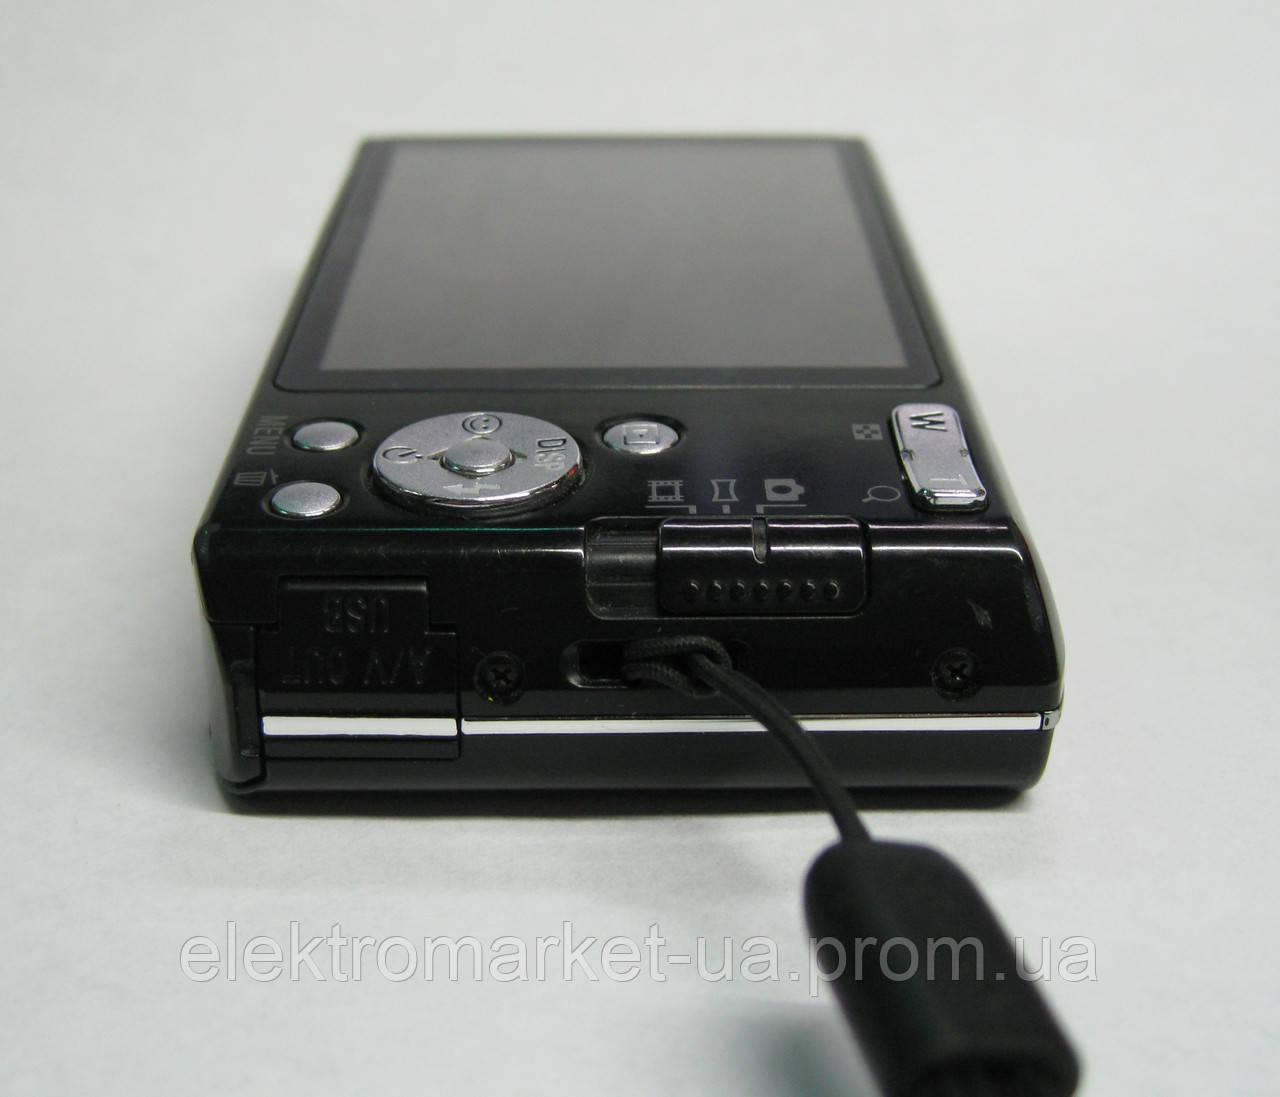 Отзыв о Цифровой фотоаппарат Sony Cyber-shot DSC-W610 | много ... | 1097x1280